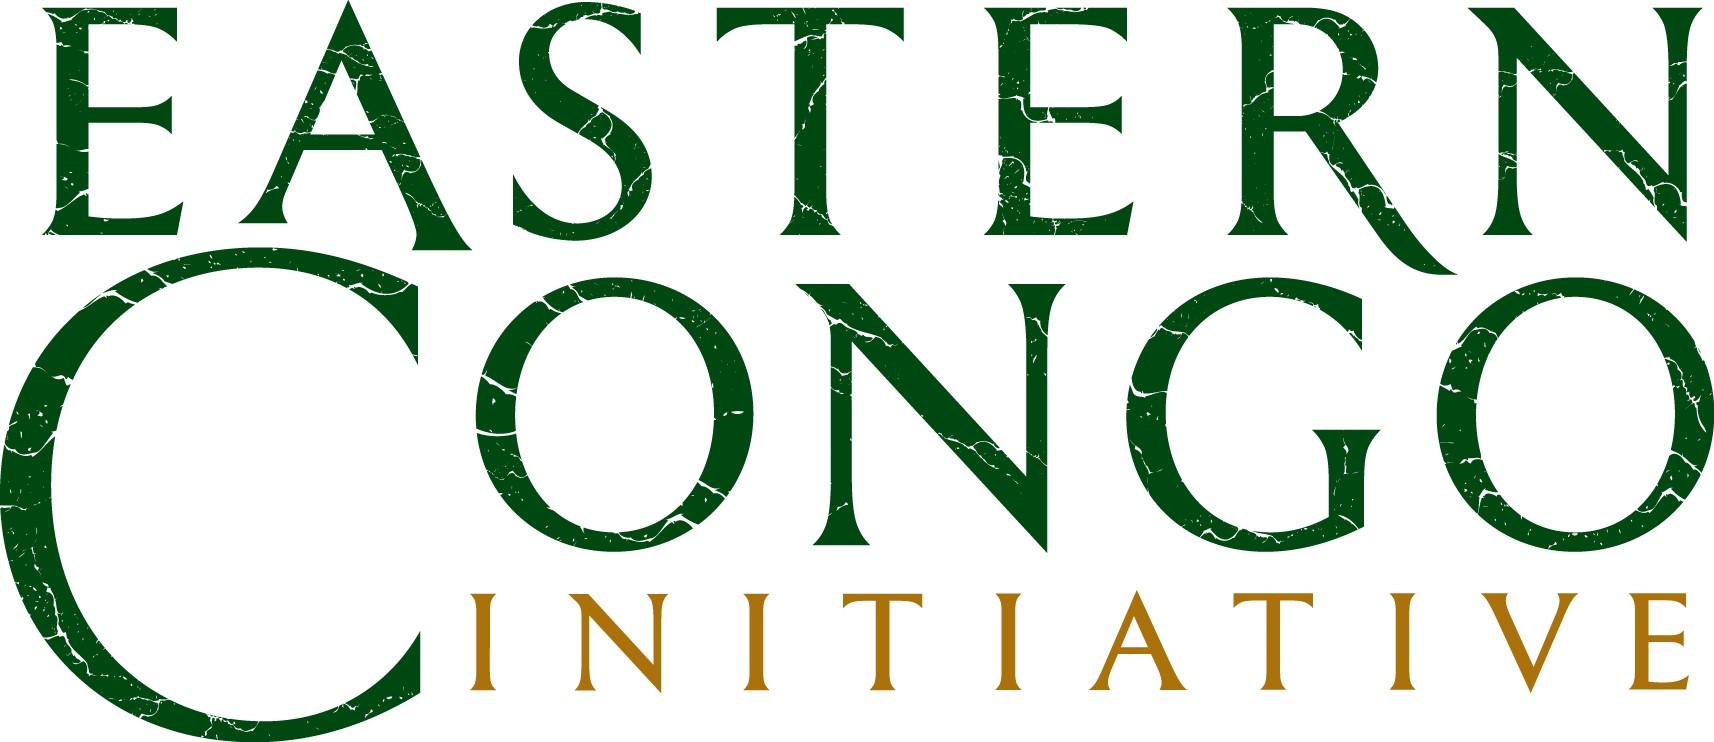 Eastern_Congo_Initiative.jpg